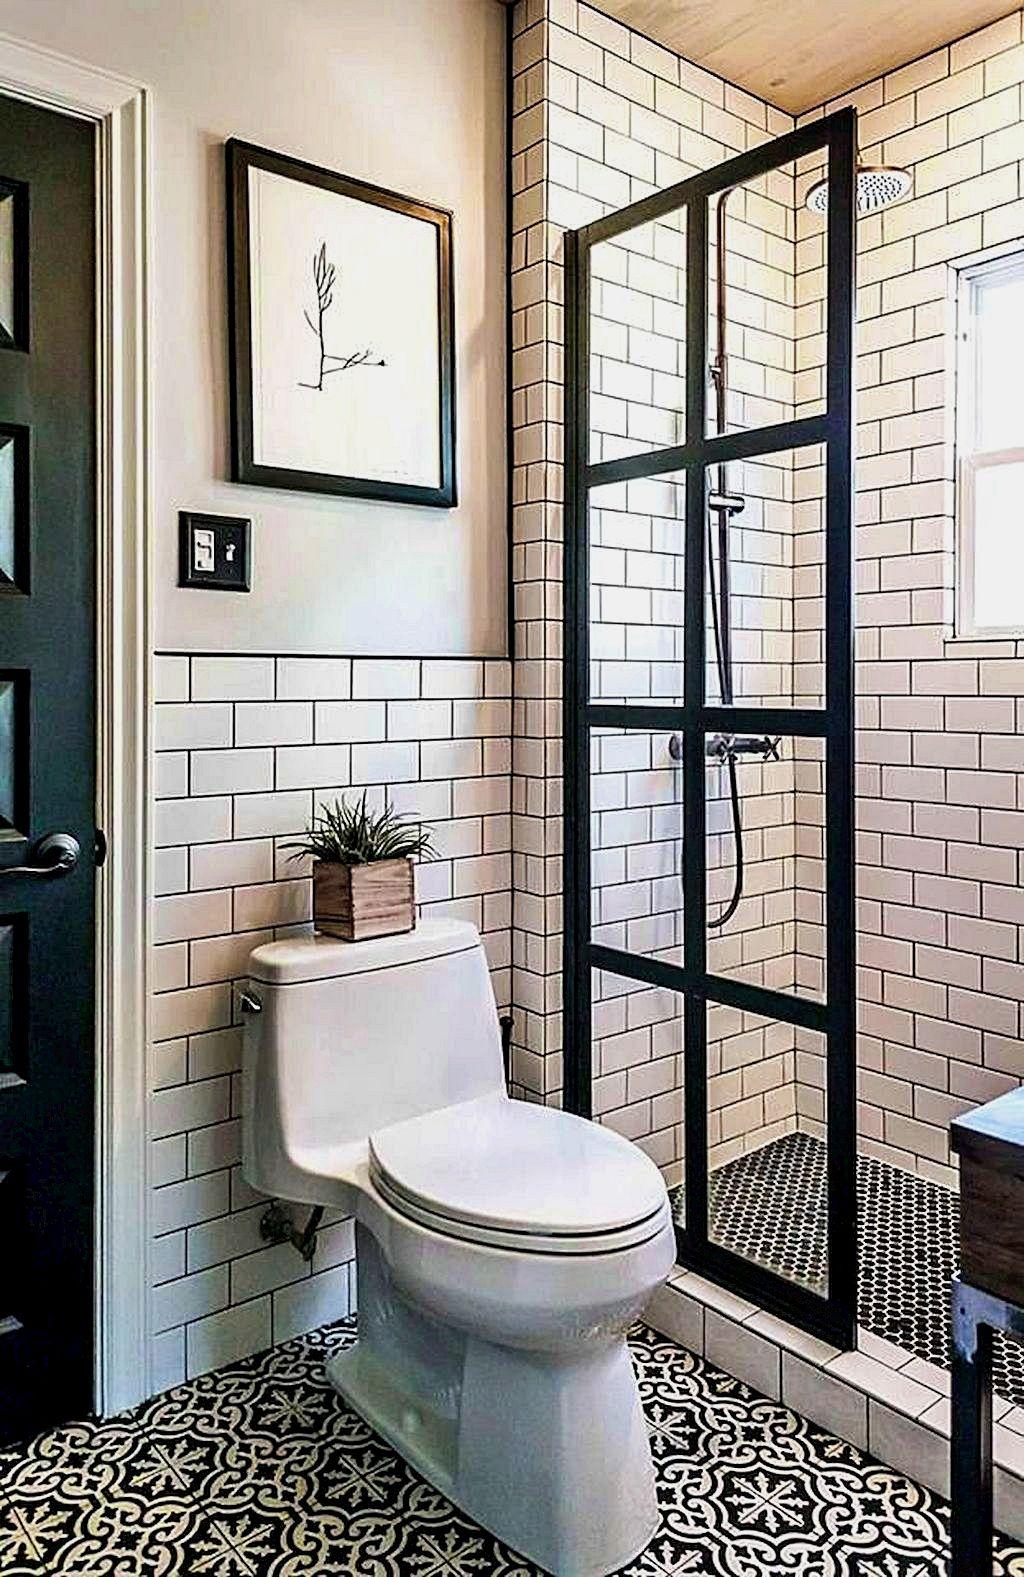 10 Glitzy And Glorious Bathroom Ideas Ideal Home Minimalist Bathroom Design Bathroom Interior Design Minimalist Bathroom